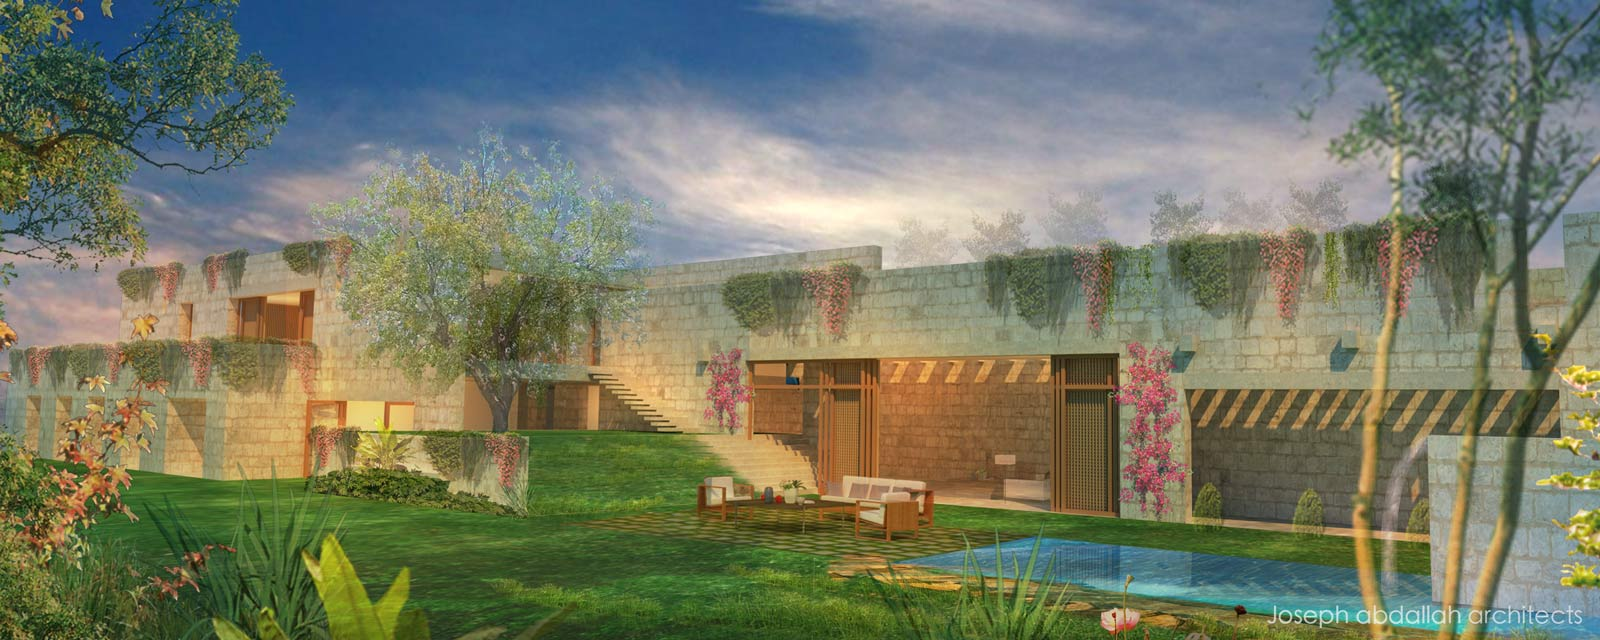 frangieh-sleiman-basel-villa-architecture-landscape-bnache-lebanon-joseph-abdallah-architects-3